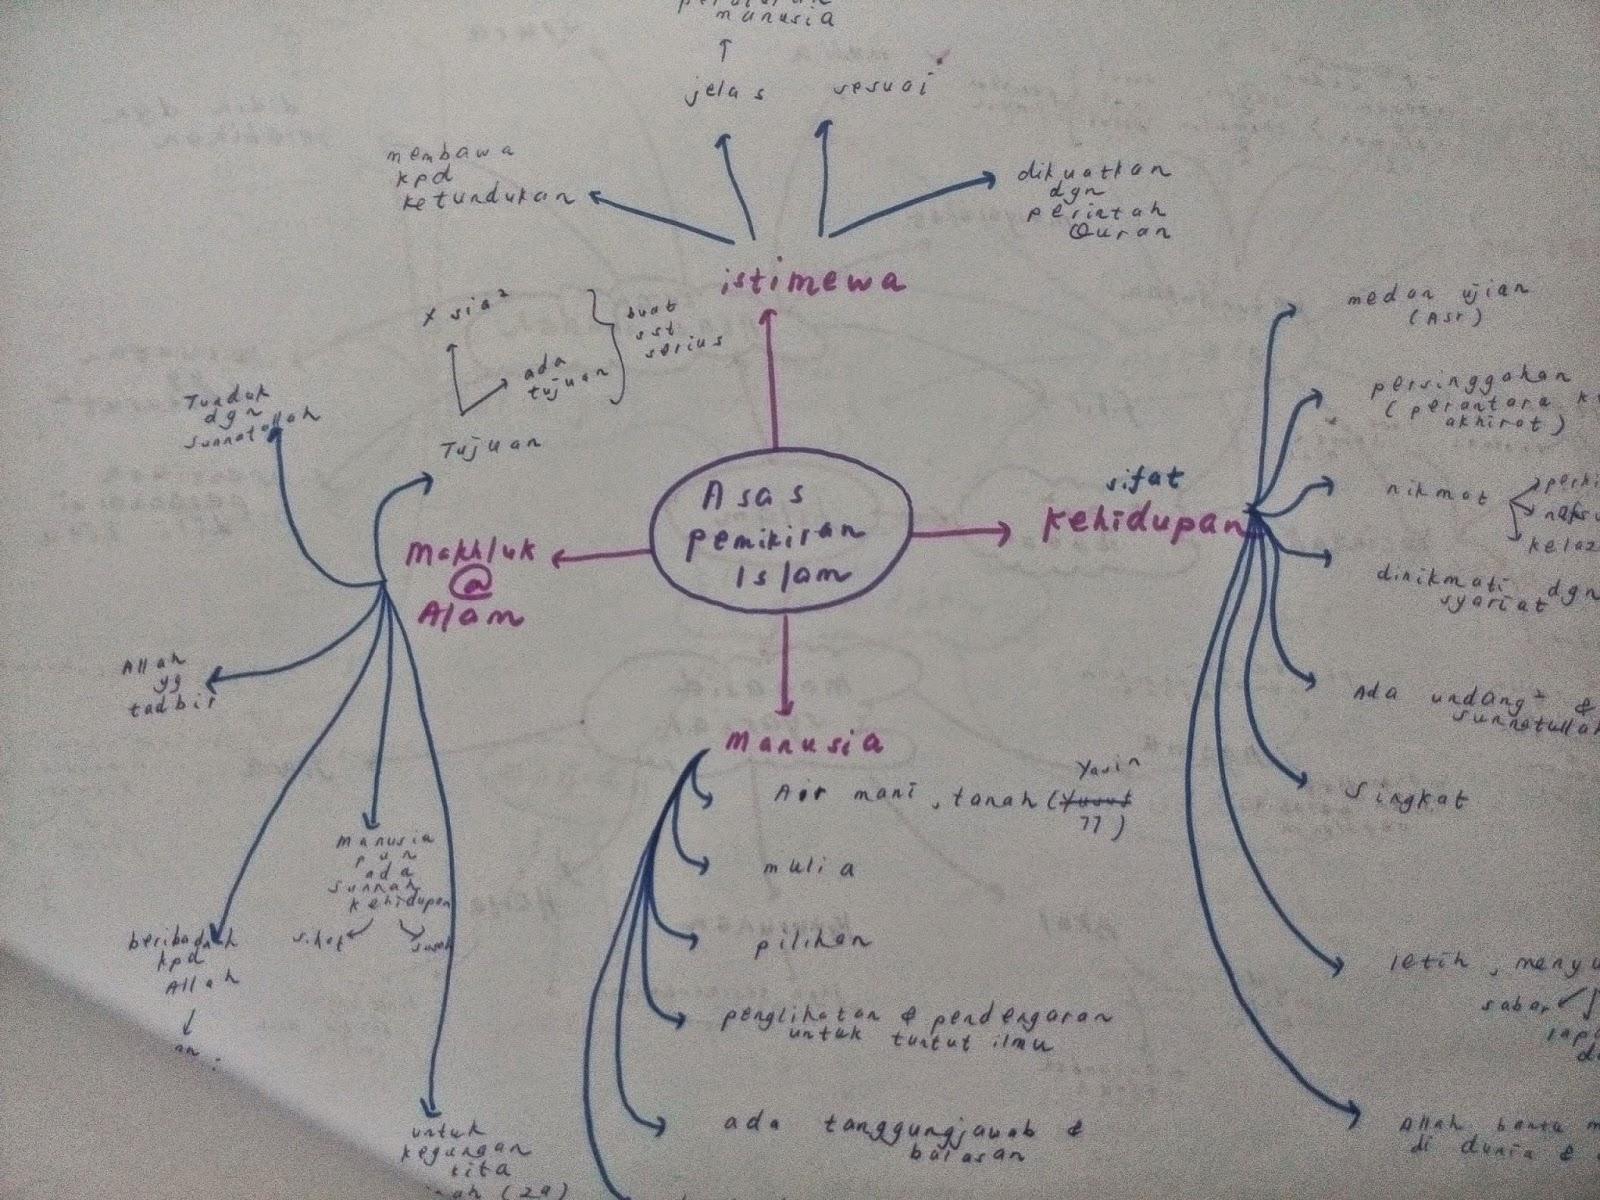 Blog farid majid 2015 peta minda pendidikan al quran yang aku buat beberapa hari sebelum final 3 ccuart Images